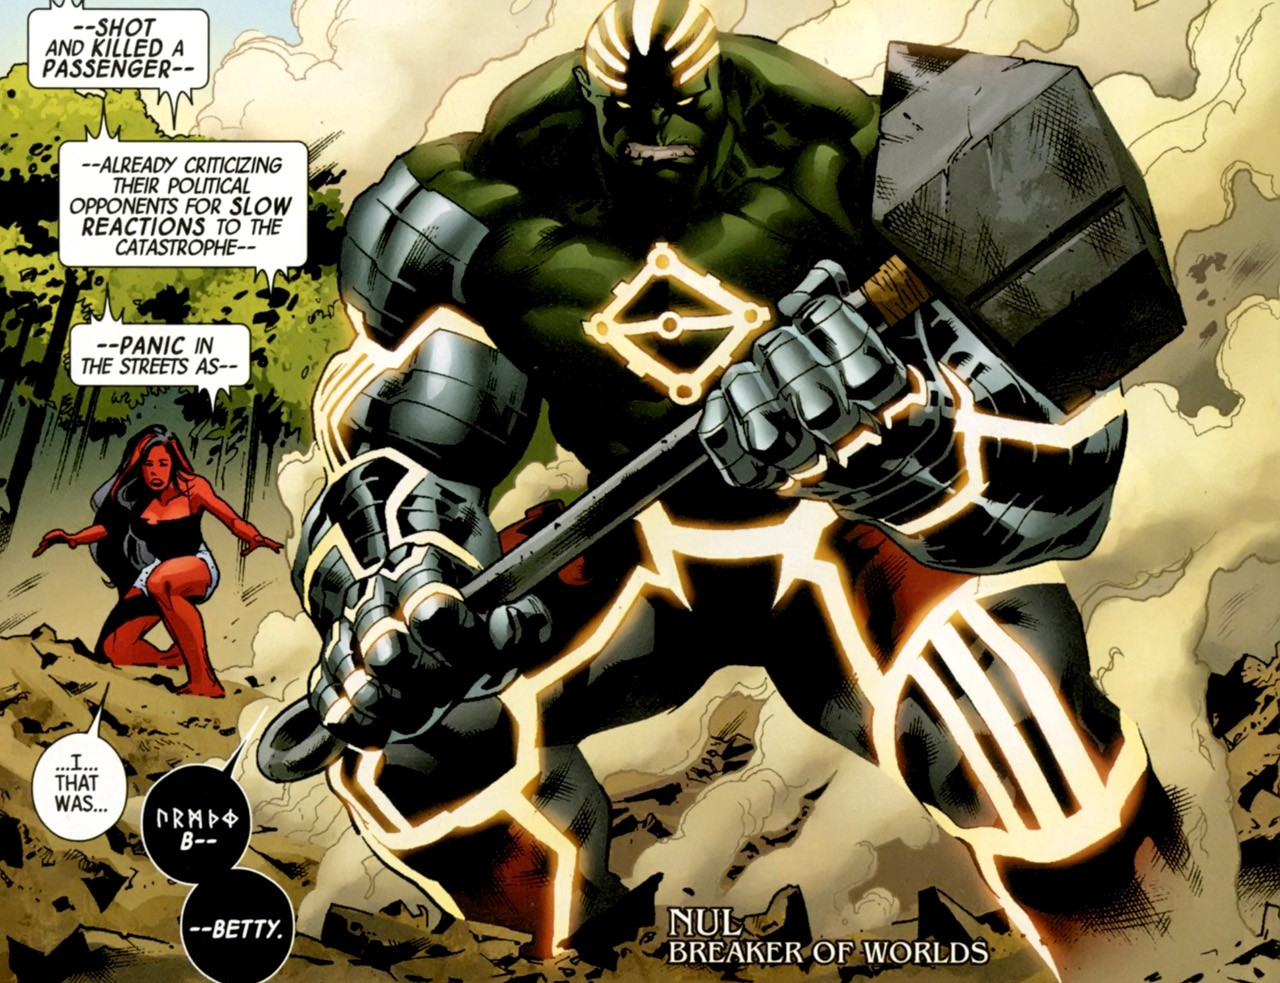 Hulk Fucks She Hulk Good x-men supreme: fear itself #2 - expanding the scope of awesome